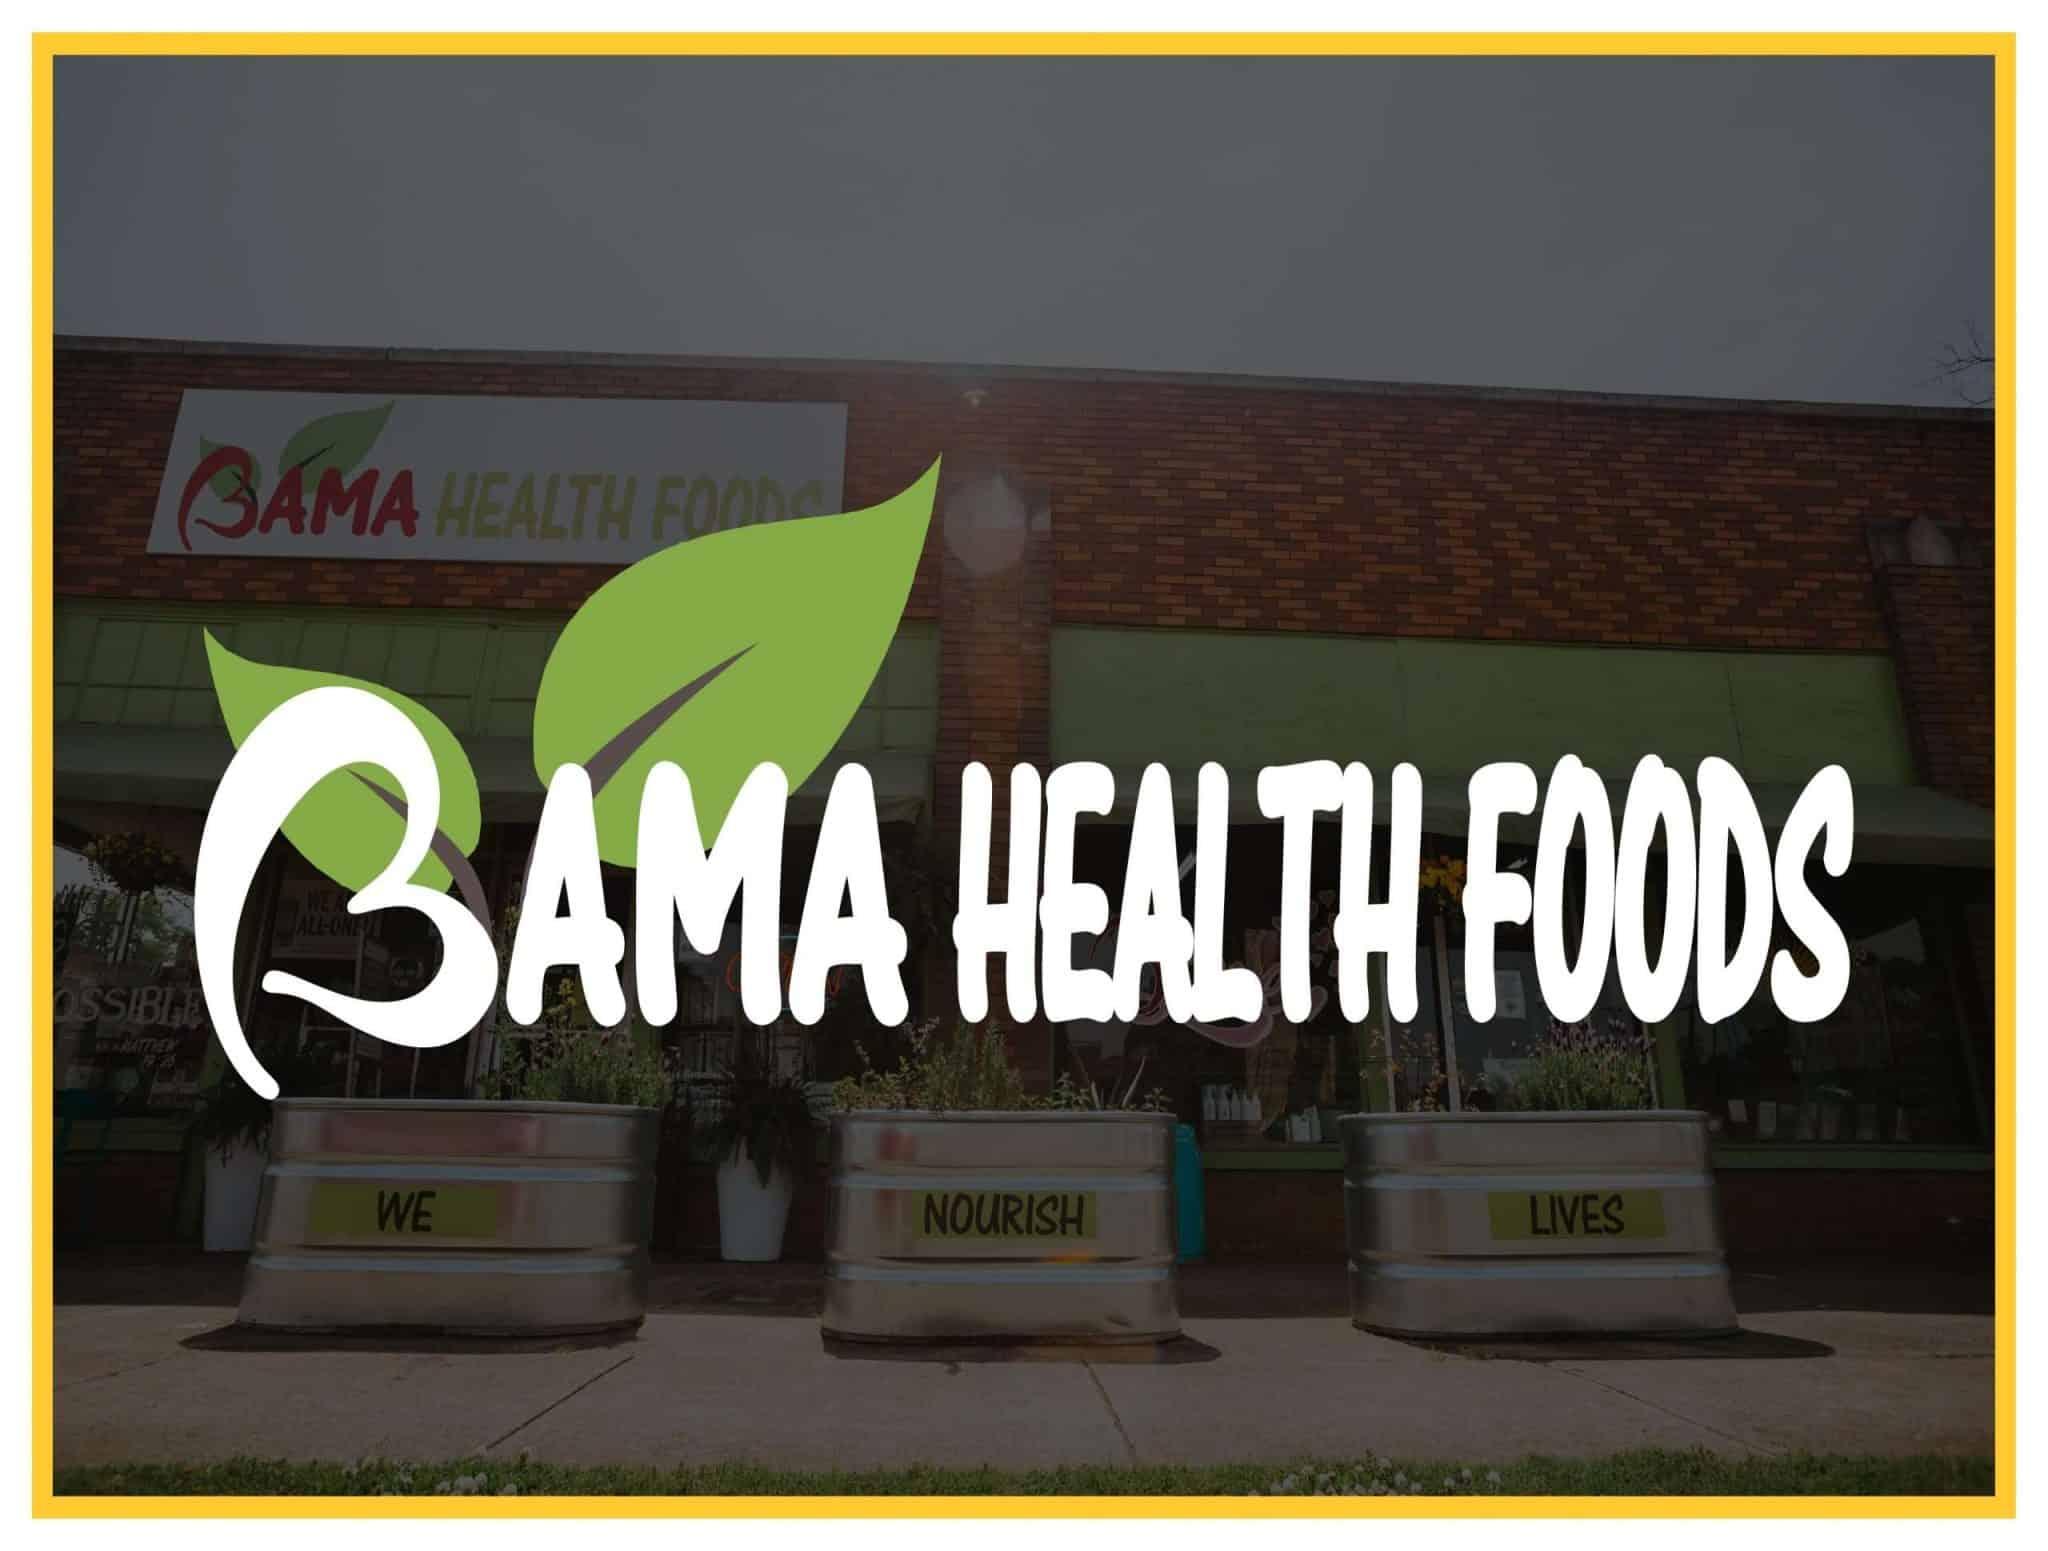 Dotedison_CS_Bama Health Foods